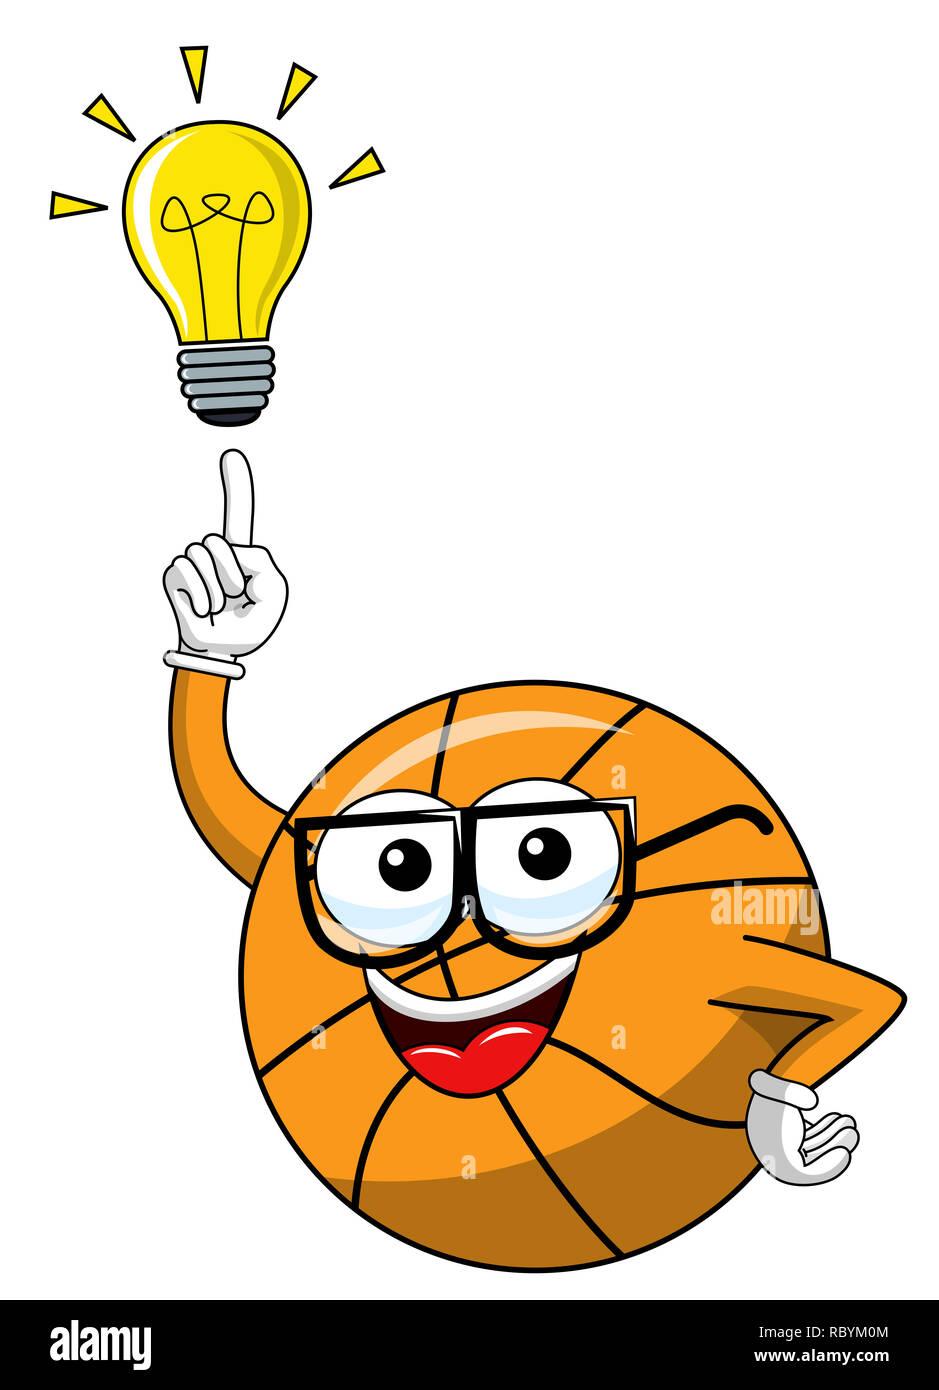 Basketball Ball Cartoon Funny Character Idea Solution Eureka Isolated On White Stock Photo Alamy